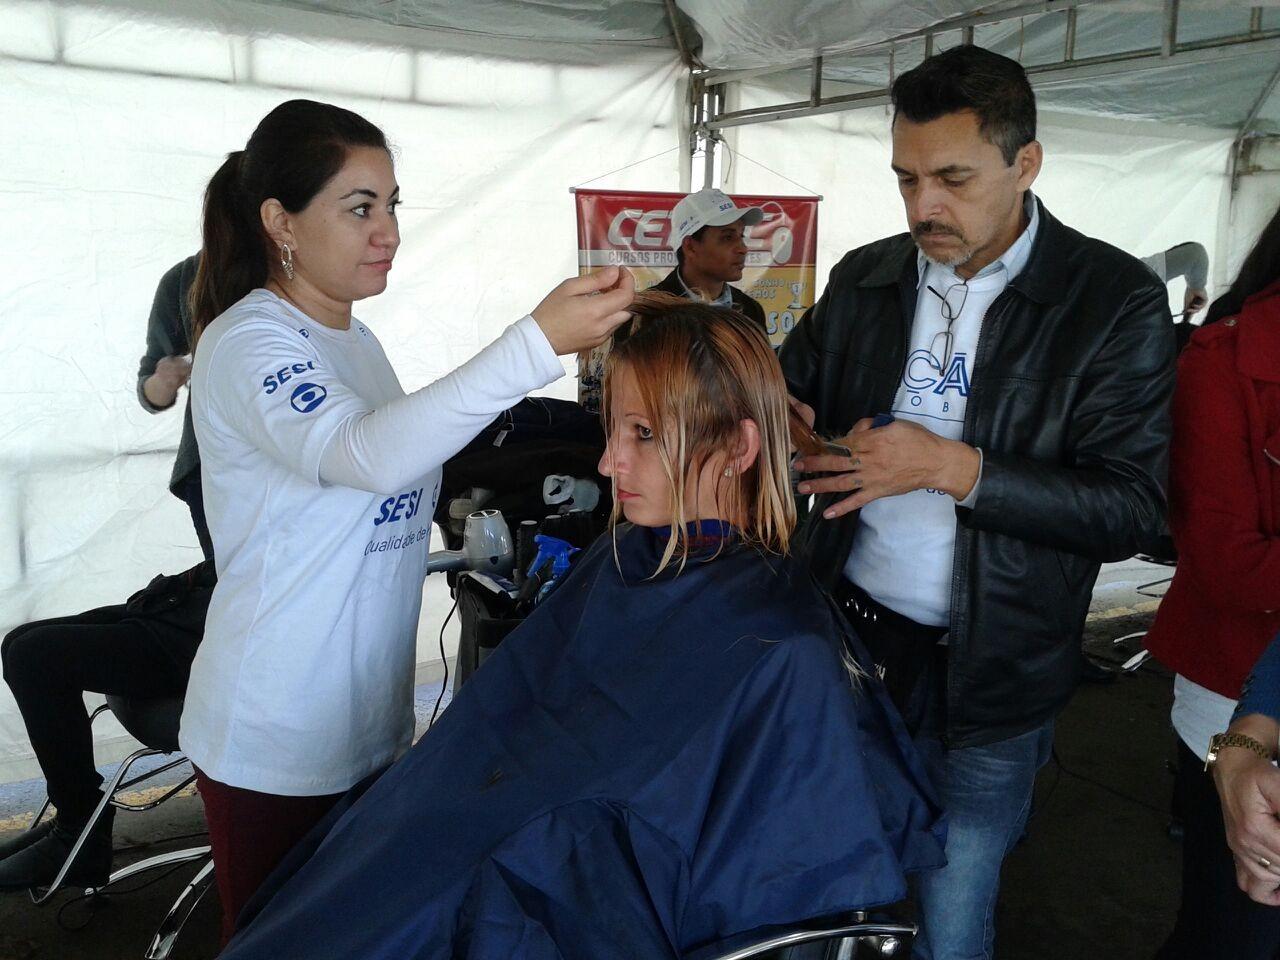 Moradores cortam cabelo gratuitamente em Caçador (Foto: Vanessa Nora/RBS TVSC)